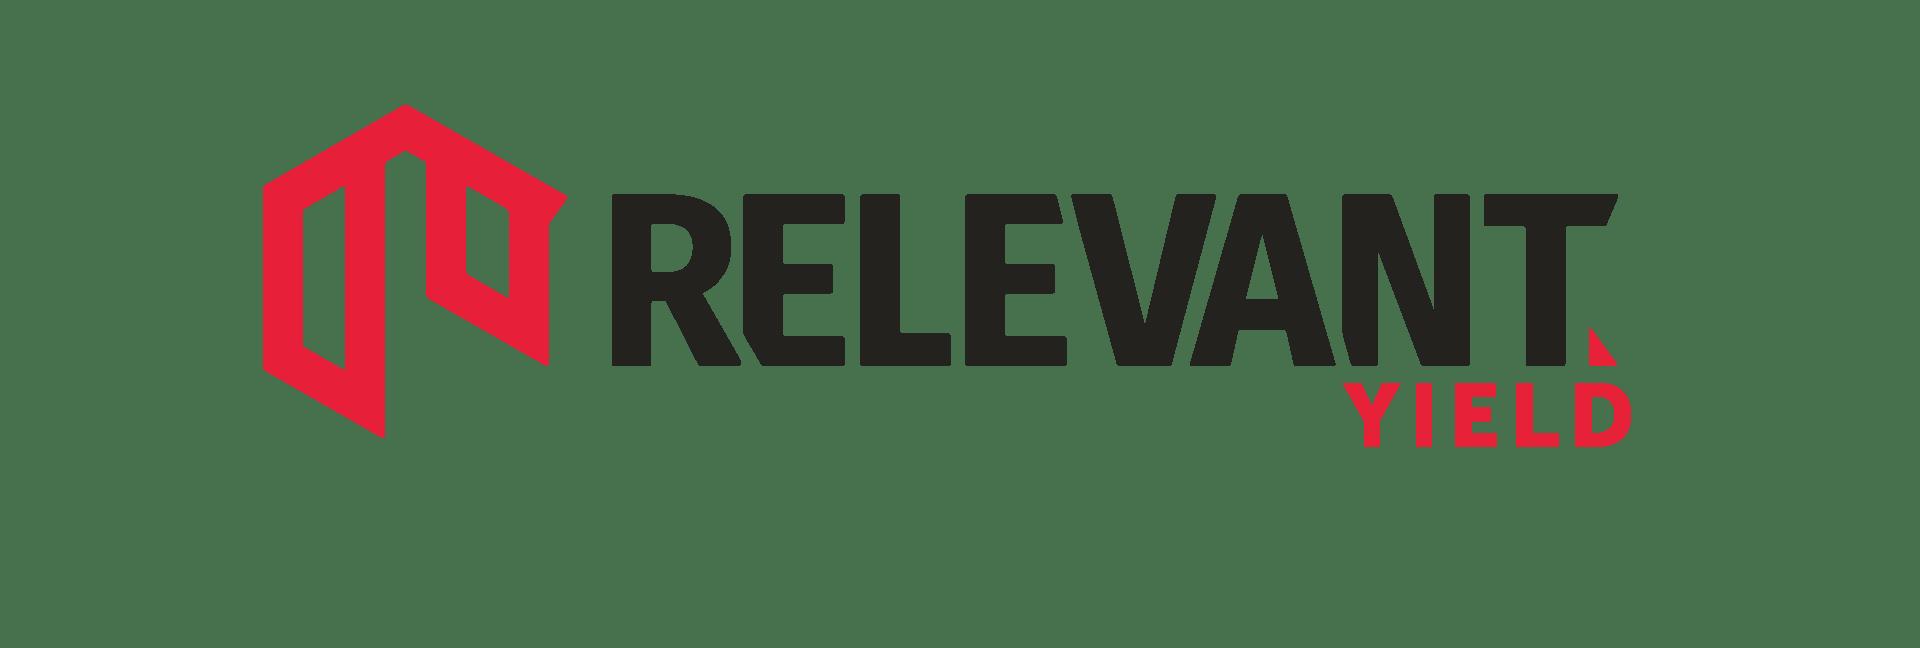 Relevant_yield_whitebg